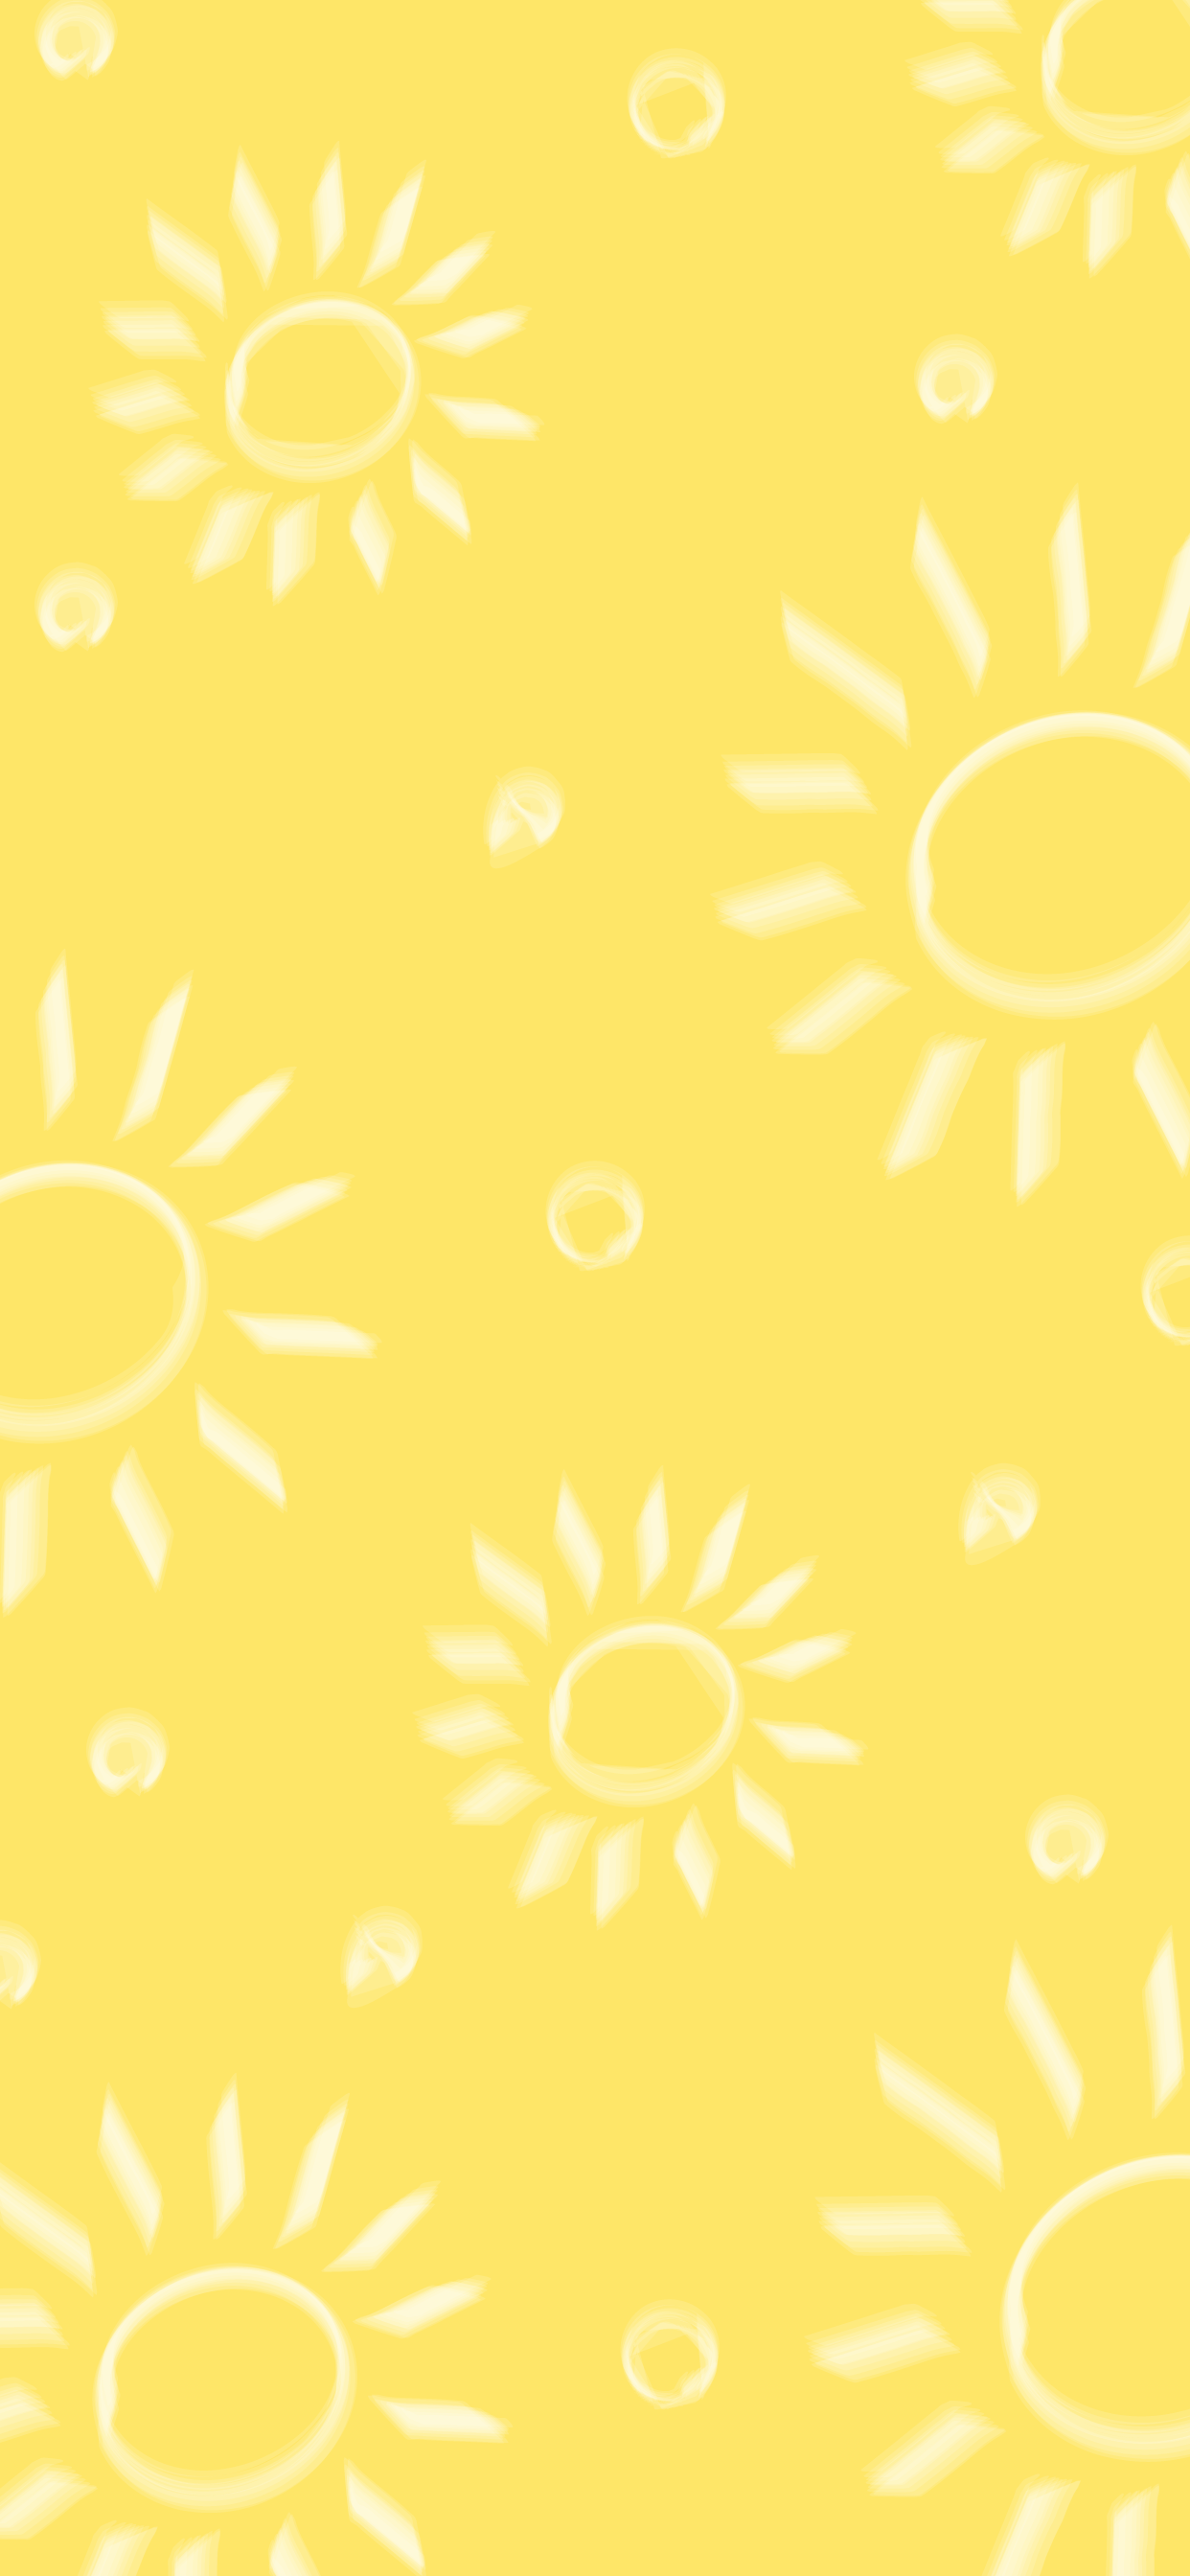 Yellow Sun Iphone Wallpaper Phone Iphone Wallpaper Yellow Iphone Wallpaper Pattern Iphone Wallpaper Vsco